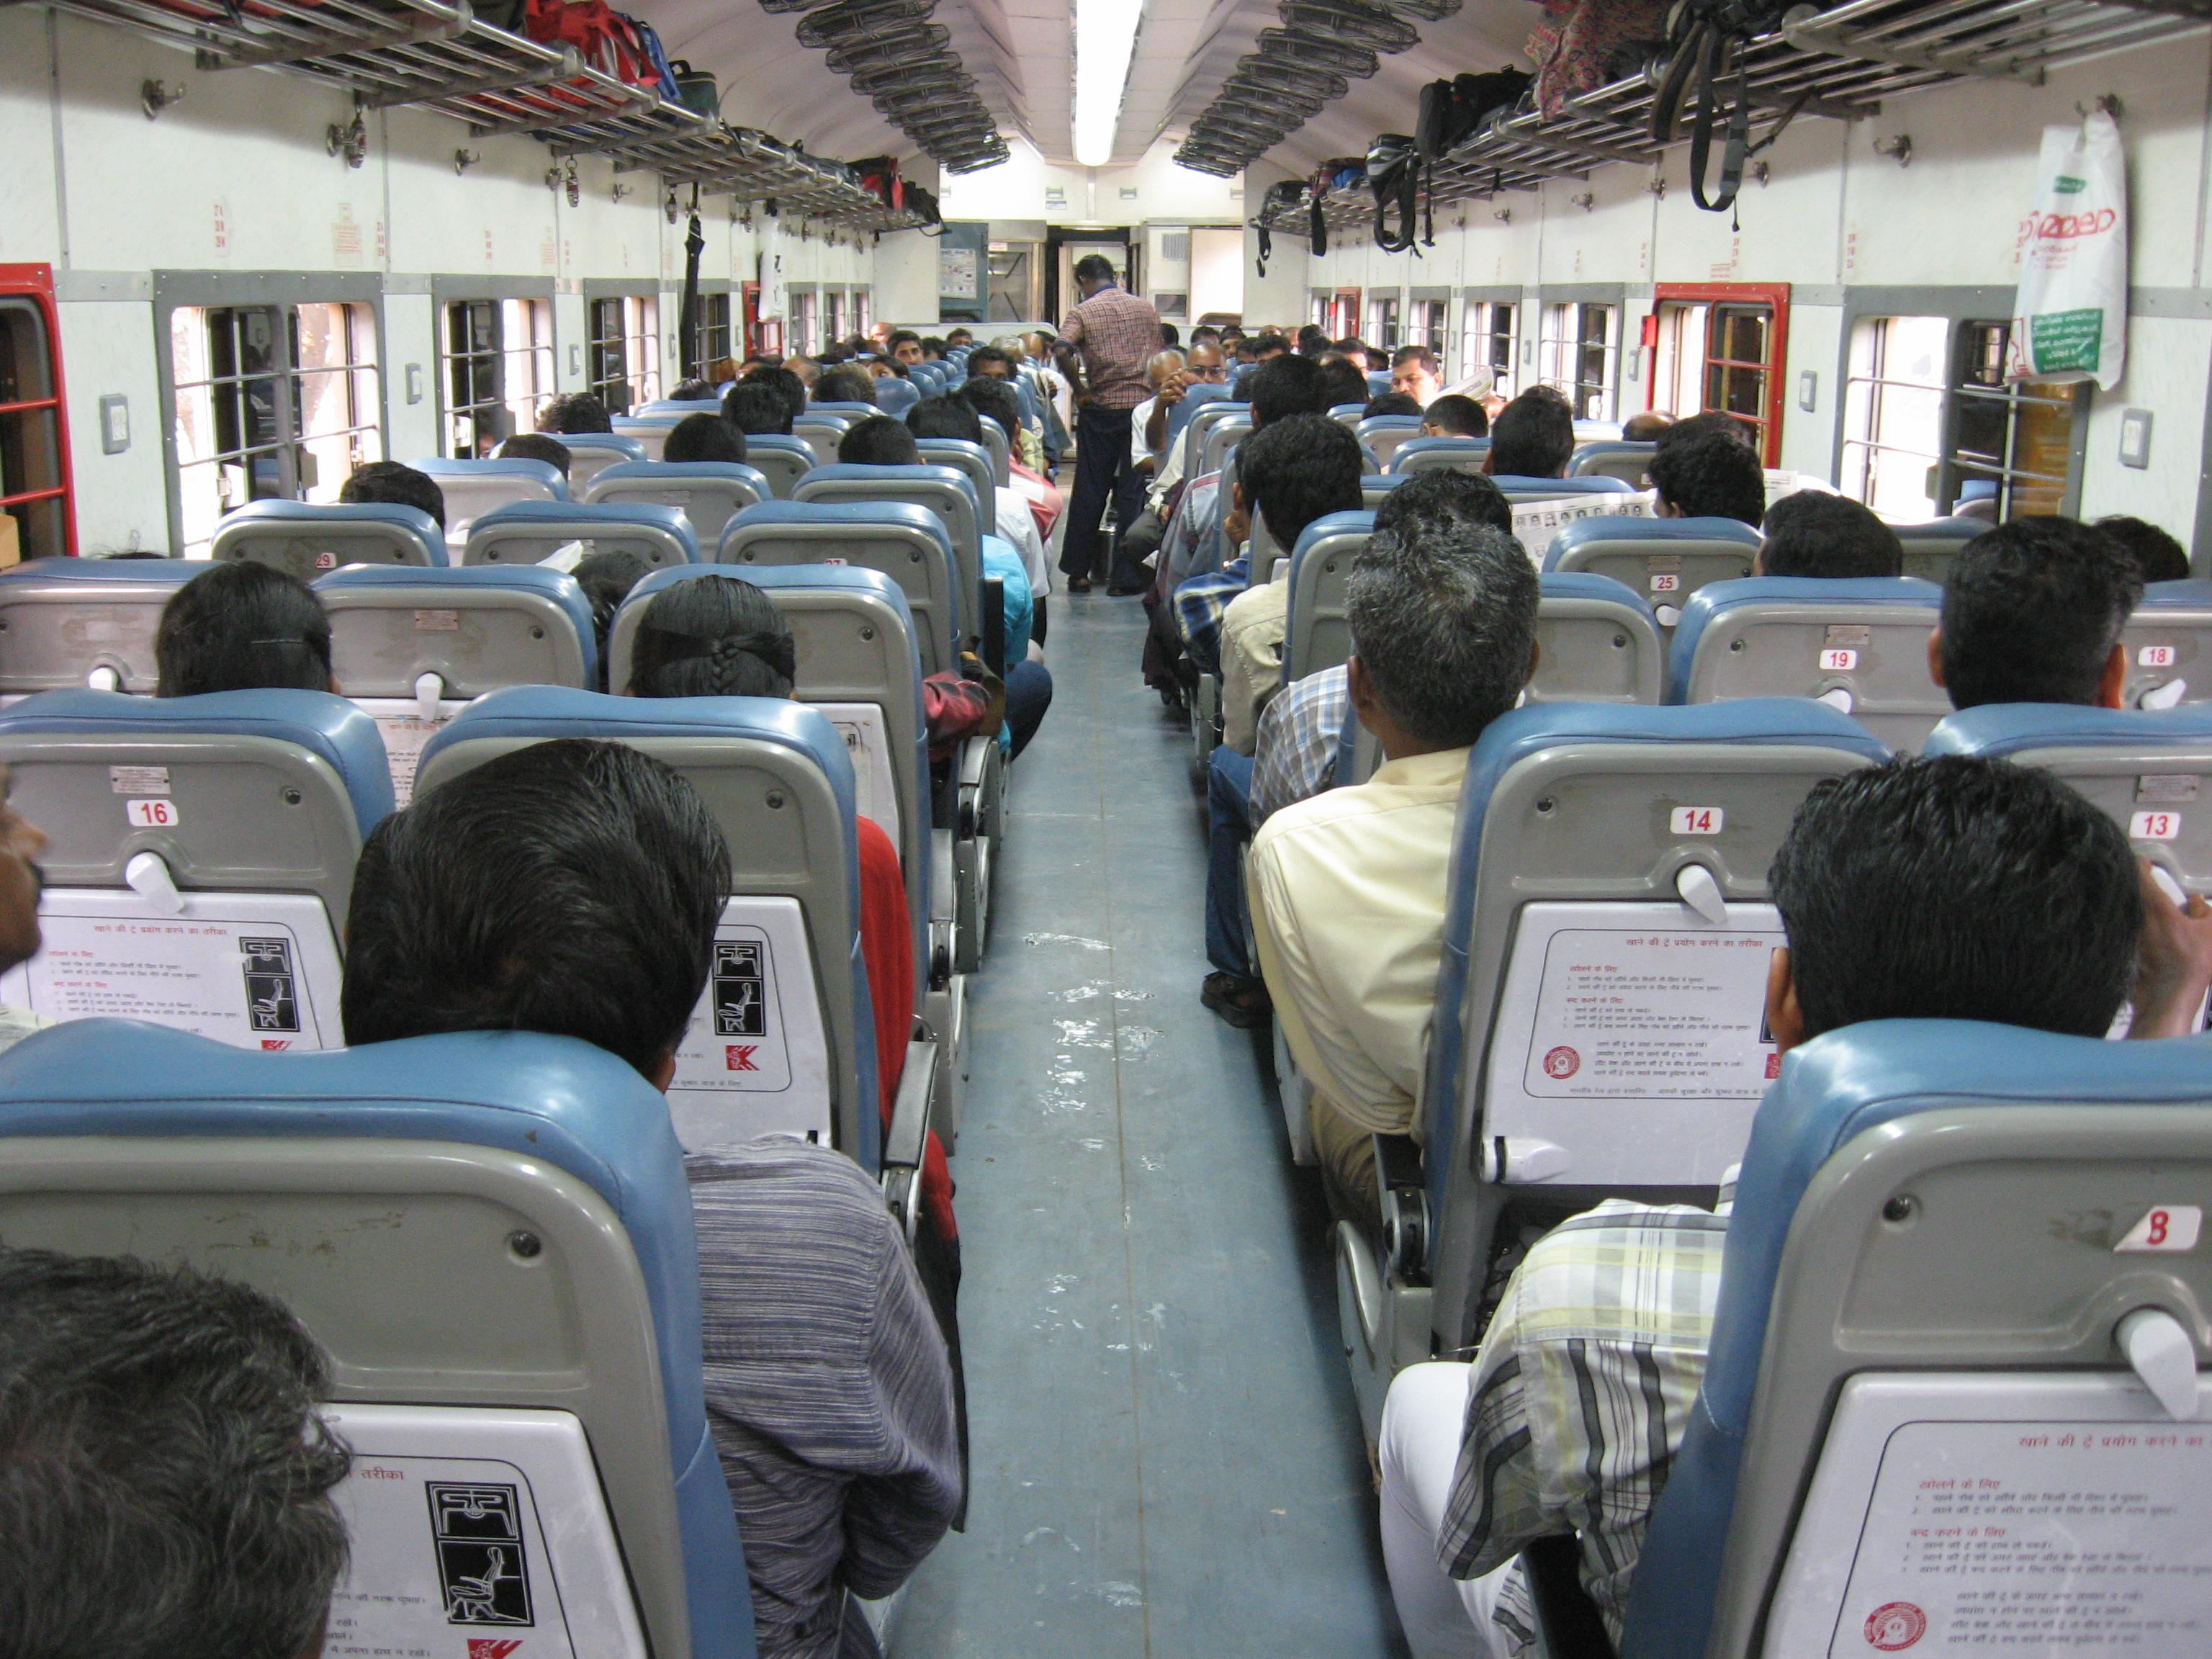 ac chair car train file janshatabdi train kerala india jpg wikimedia